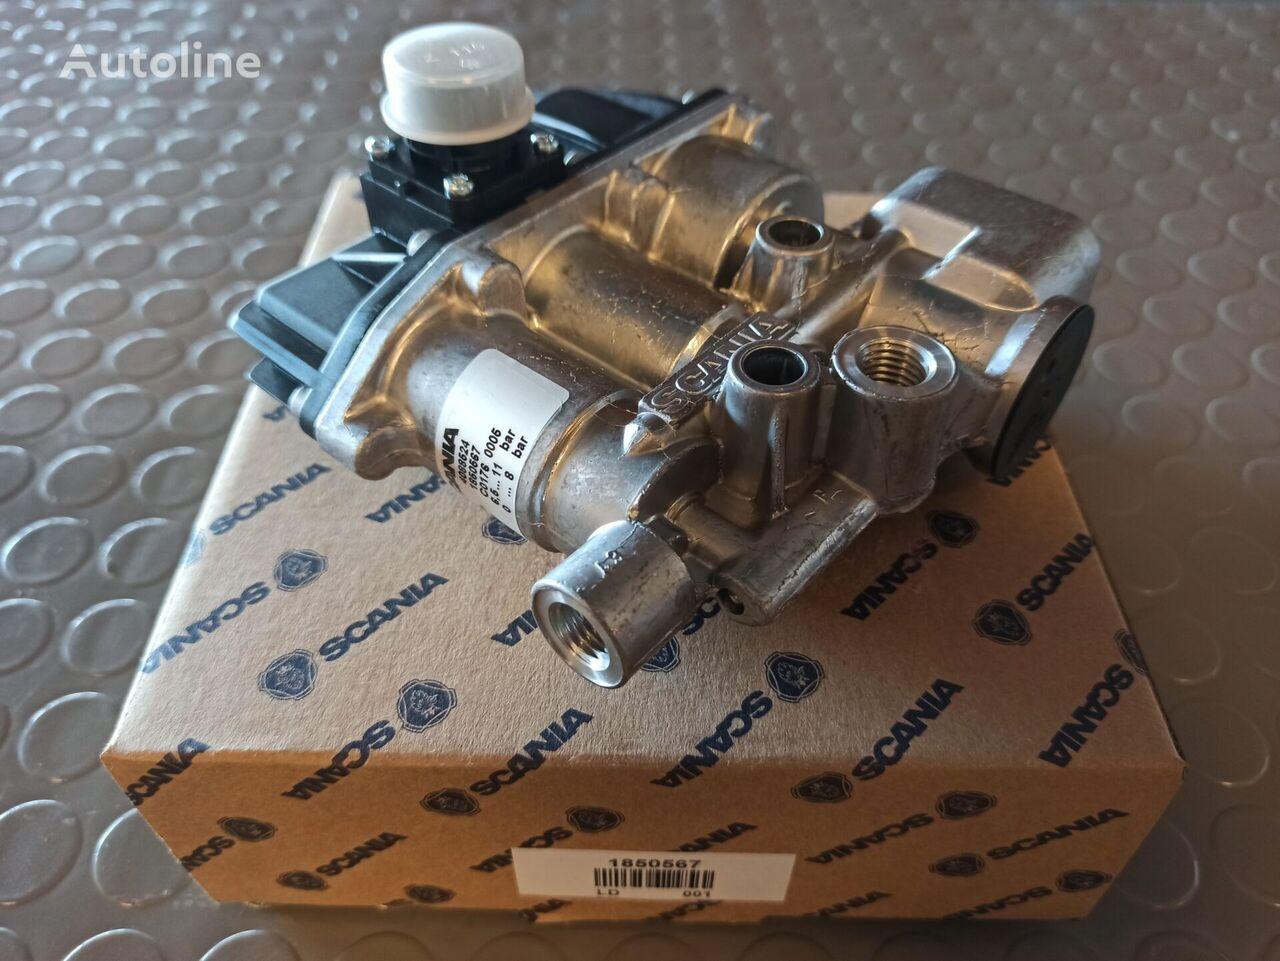 new SOLENOID VALVE BLOCK (1850567) pneumatic valve for tractor unit